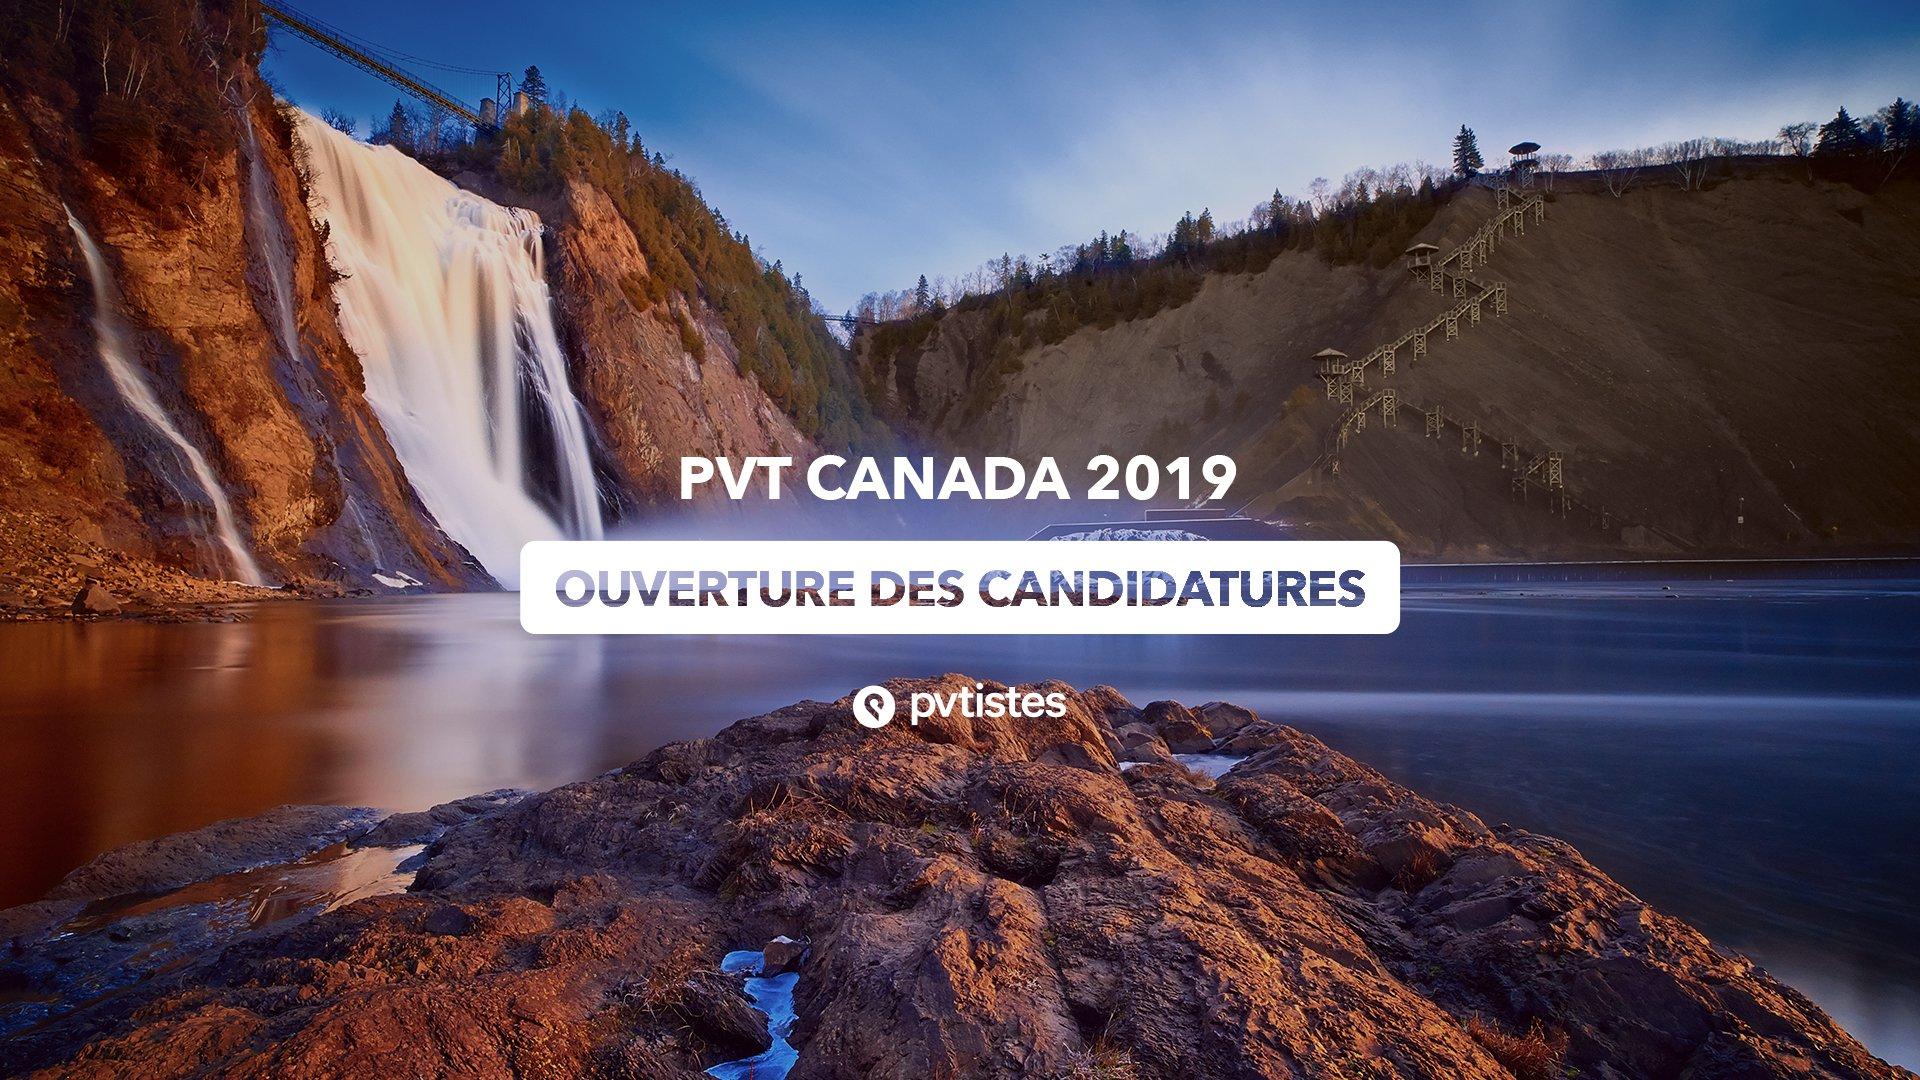 Nom : pvtistes-ouverture-du-pvt-canada-2019.jpg Affichages : 244 Taille : 438,6 Ko